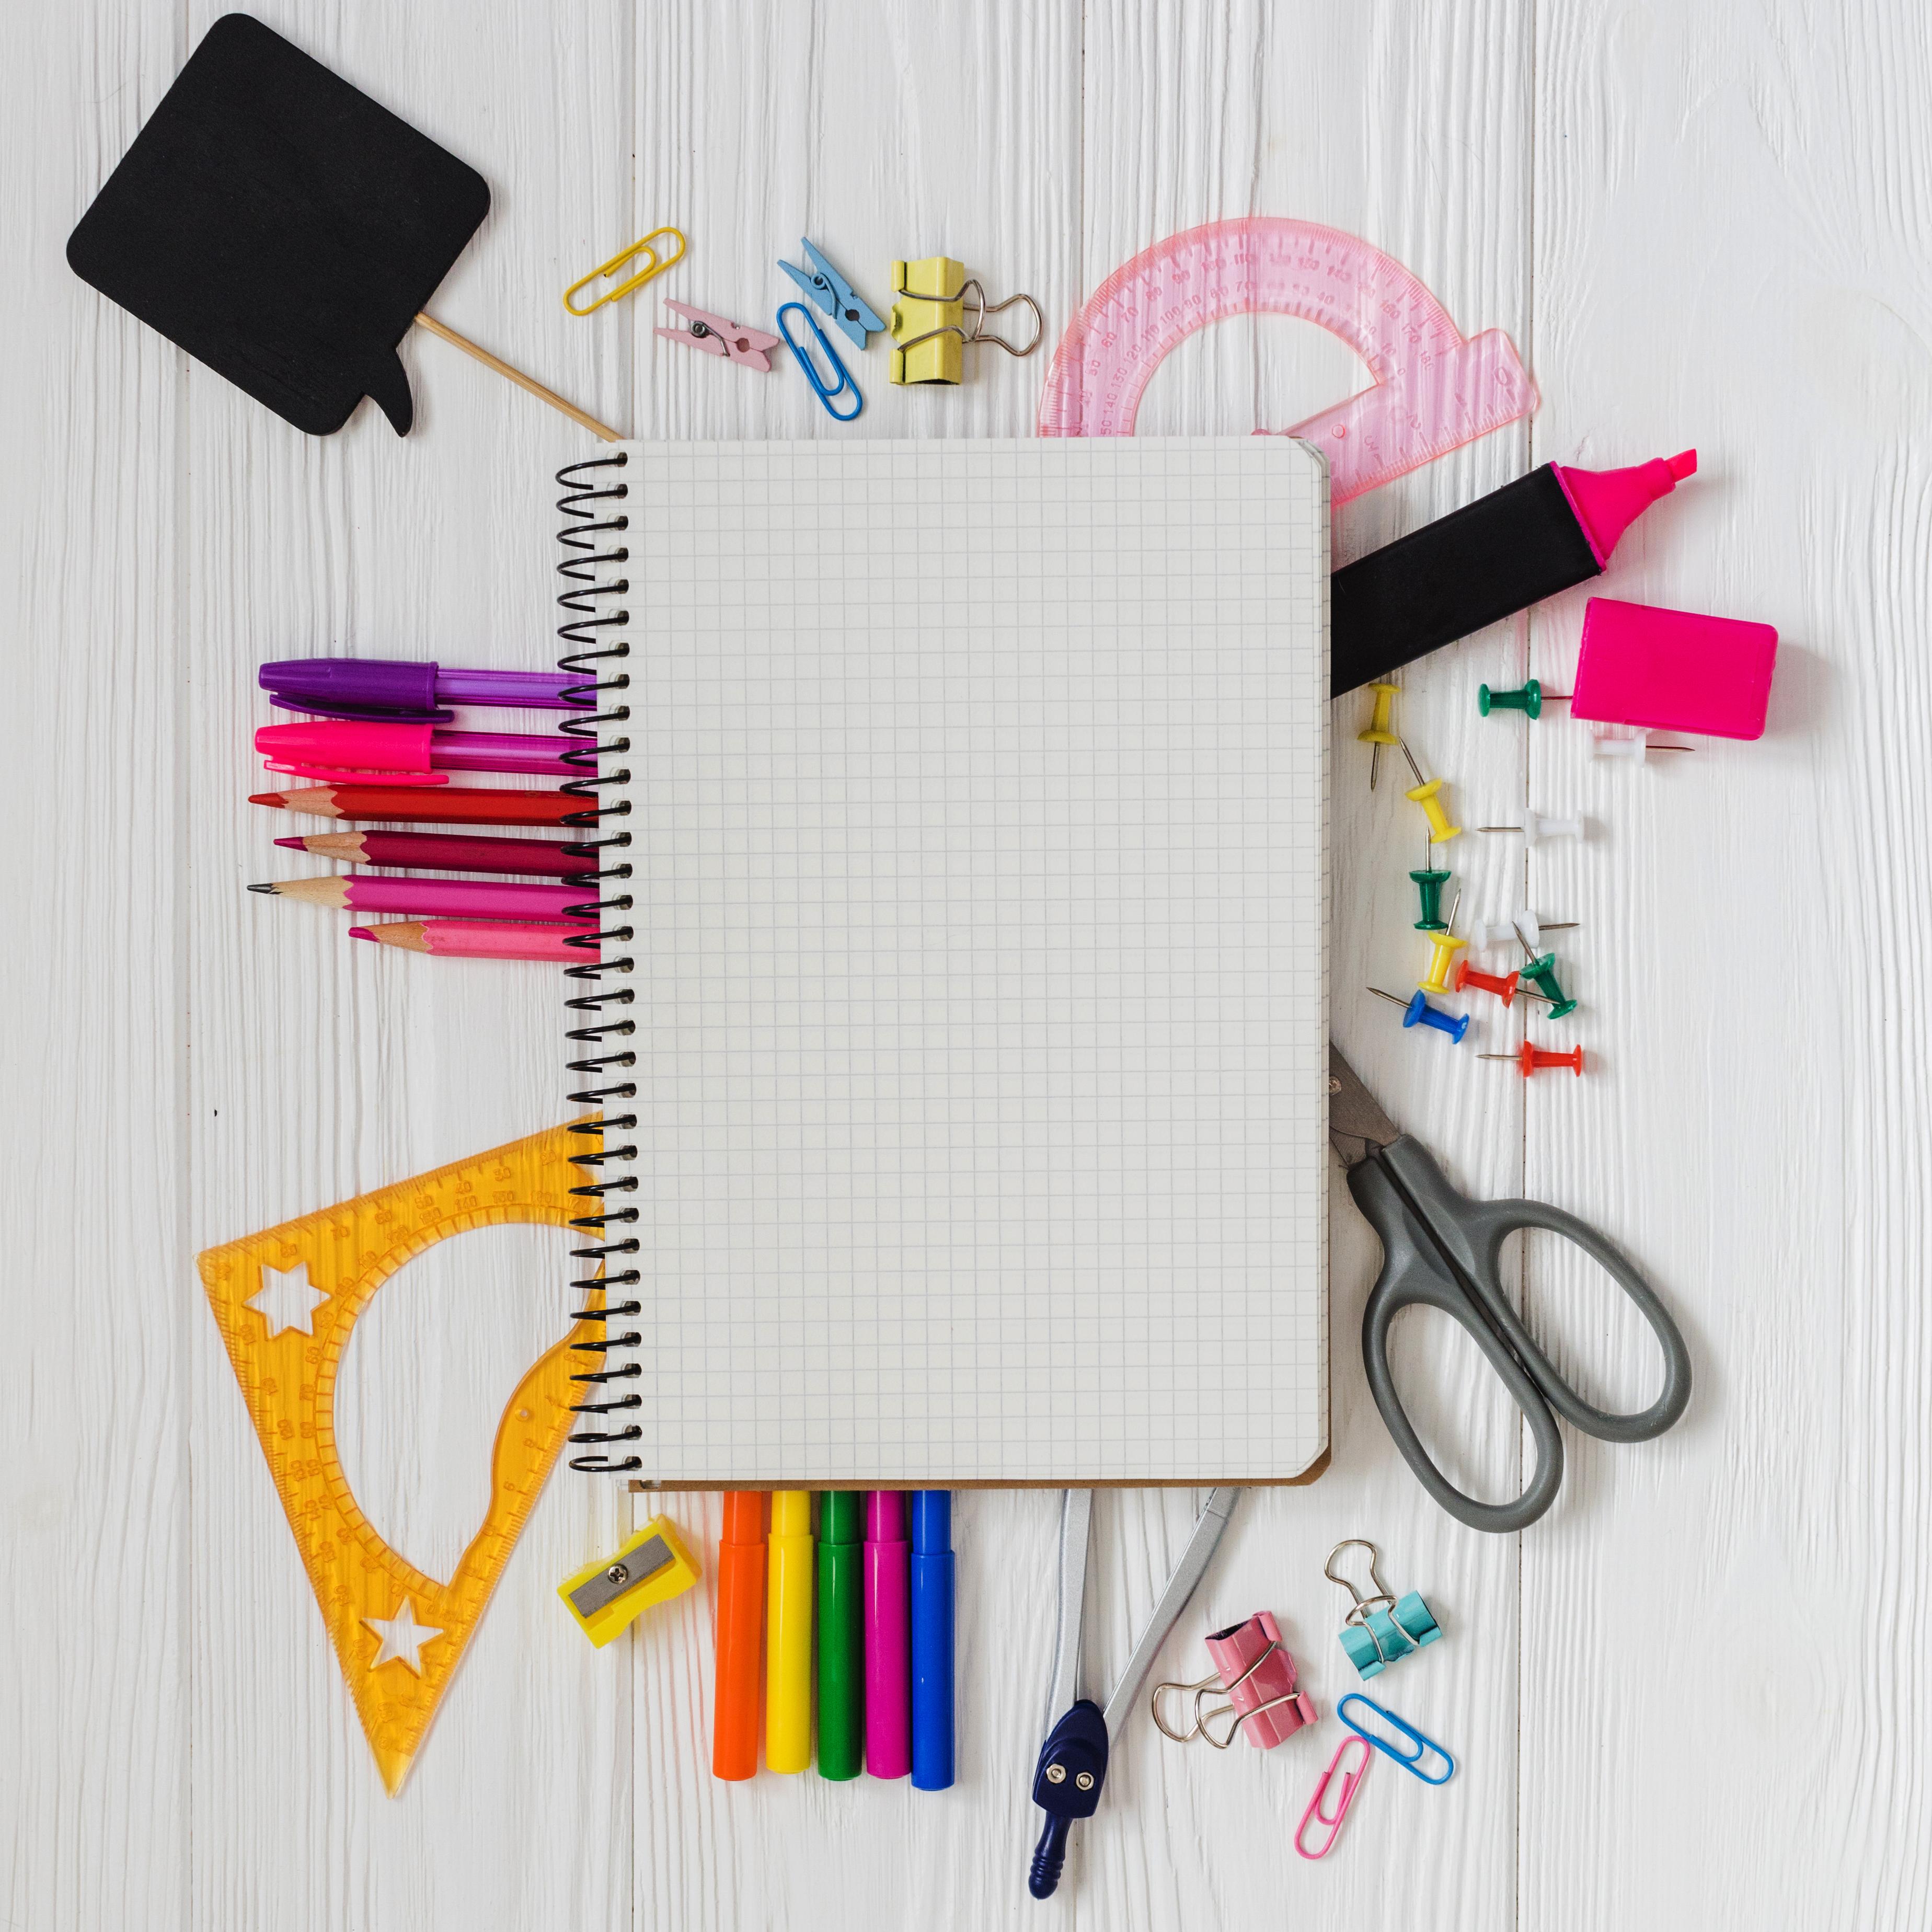 MEC publica Portaria sobre Recursos Educacionais Abertos (REA)